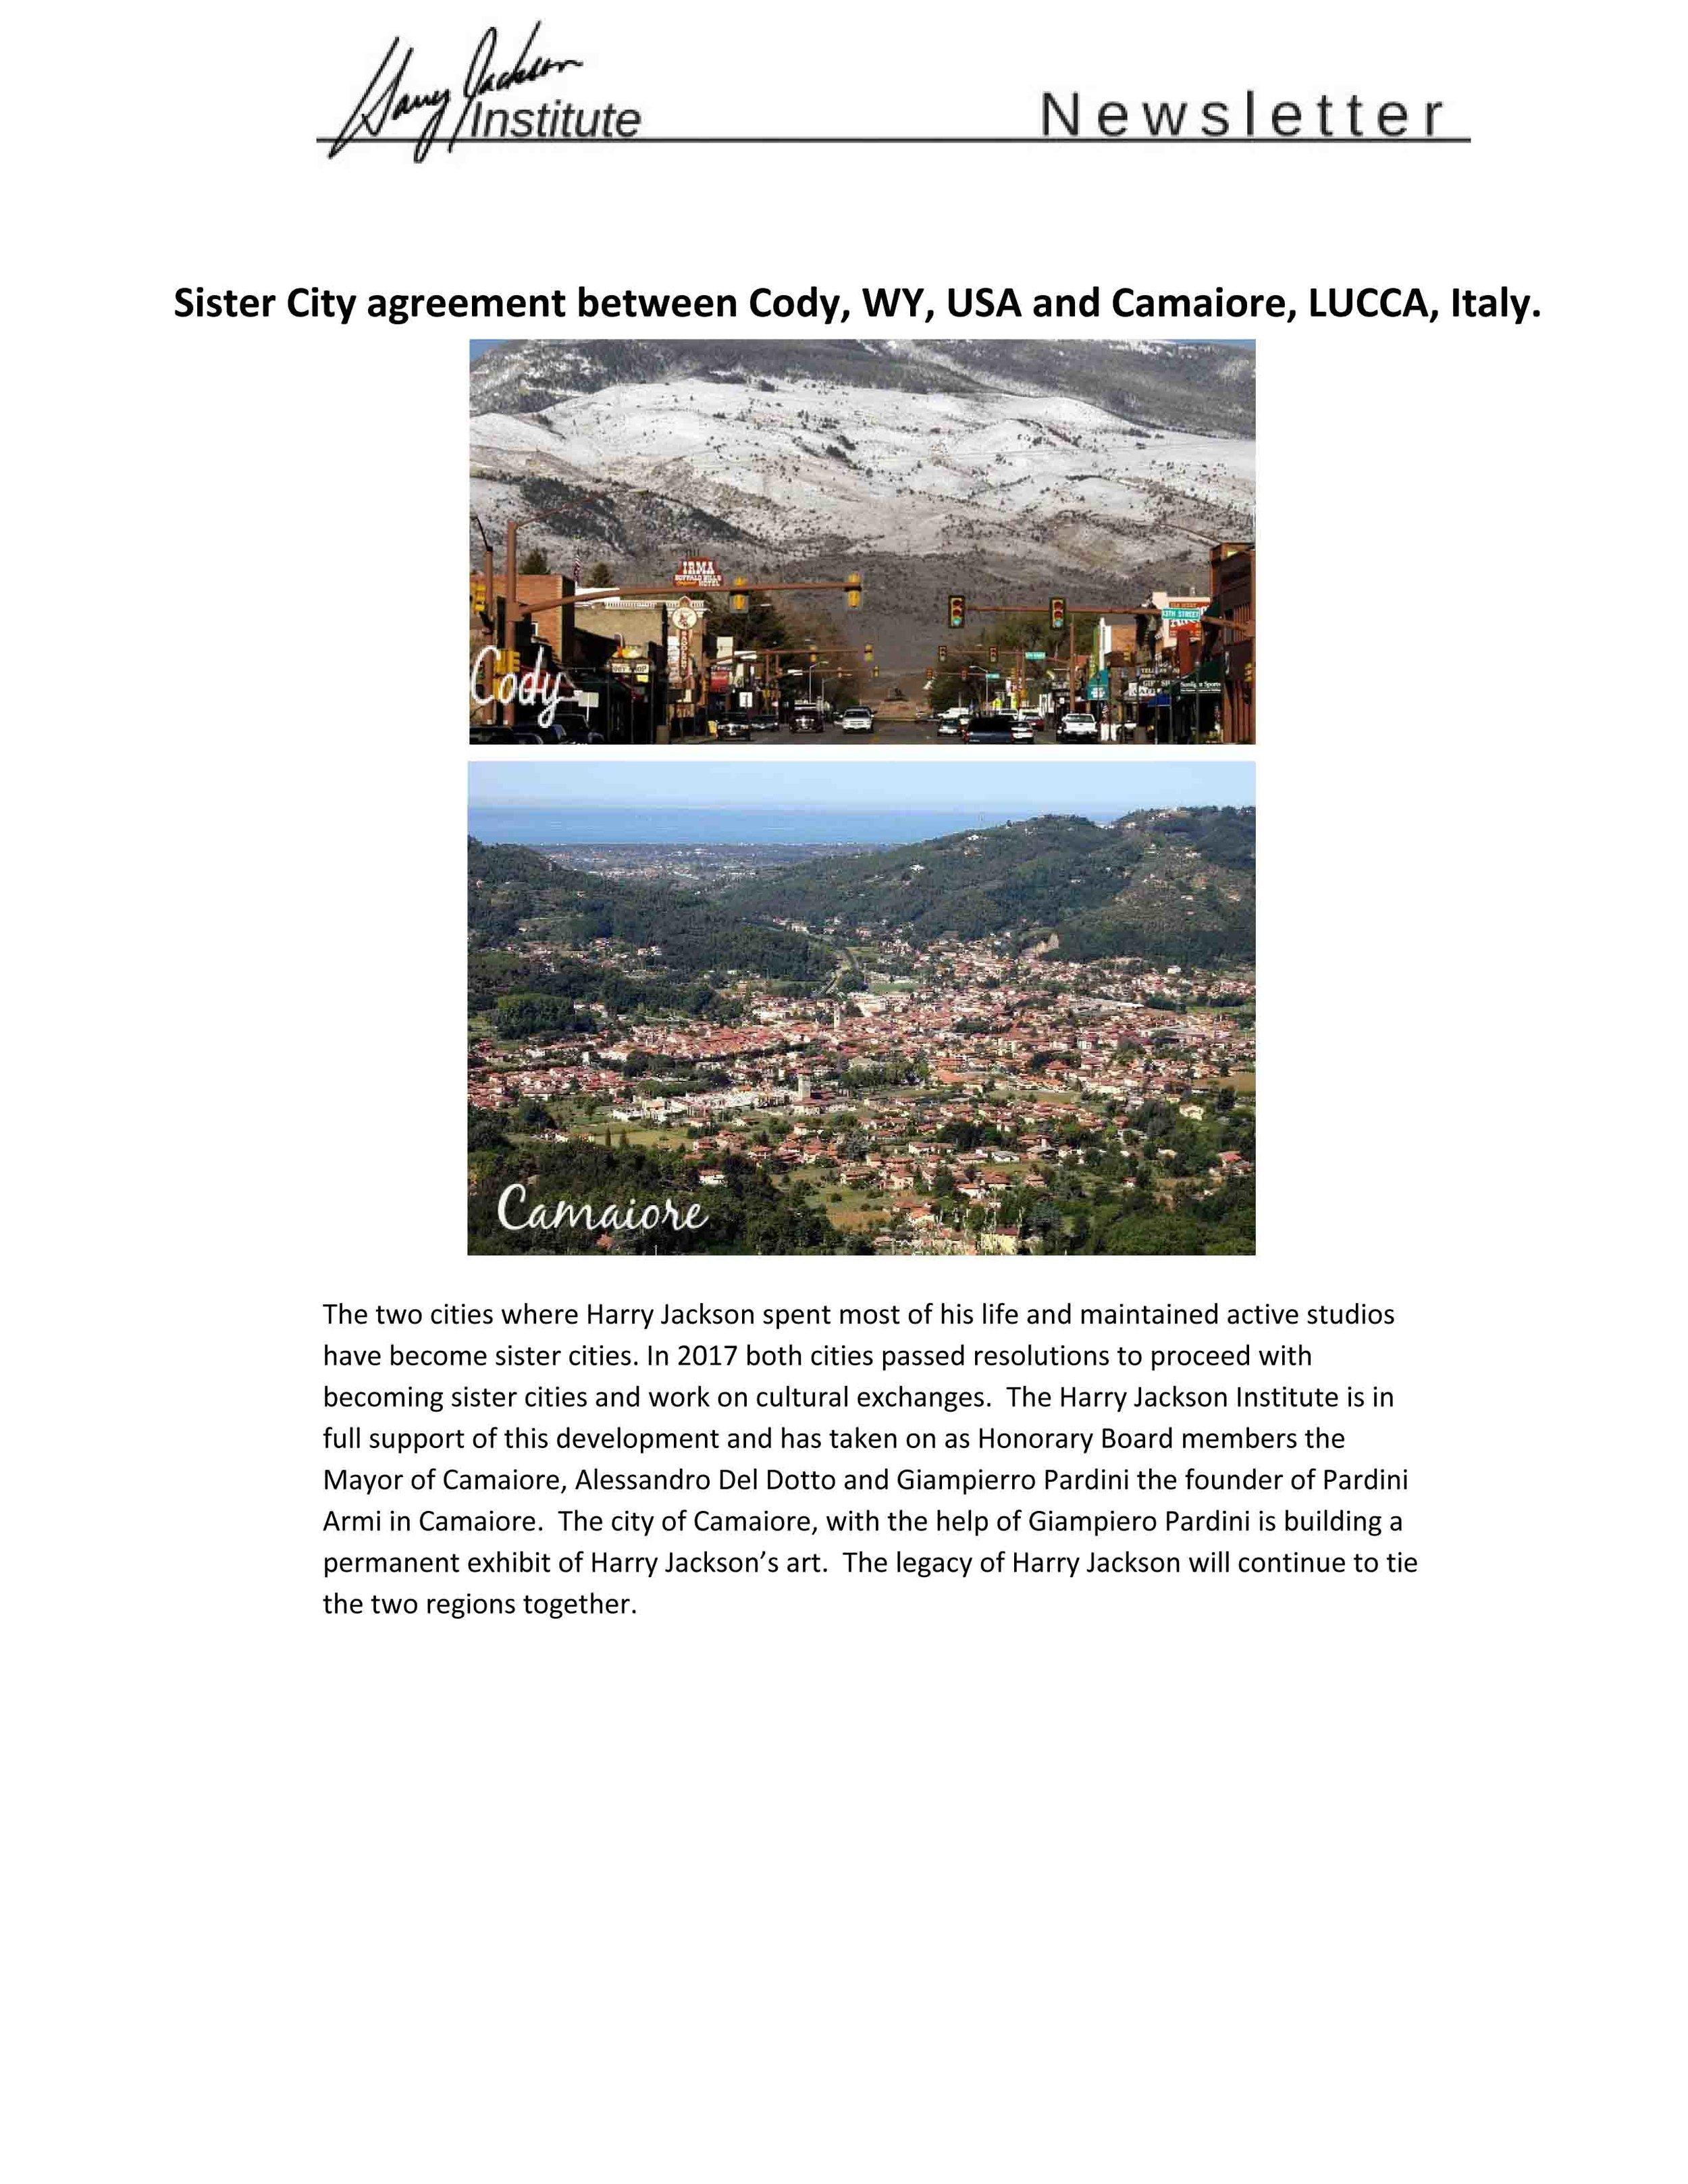 2017_10_01 Harry Jackson Iinstitute Newsletter-8.jpg